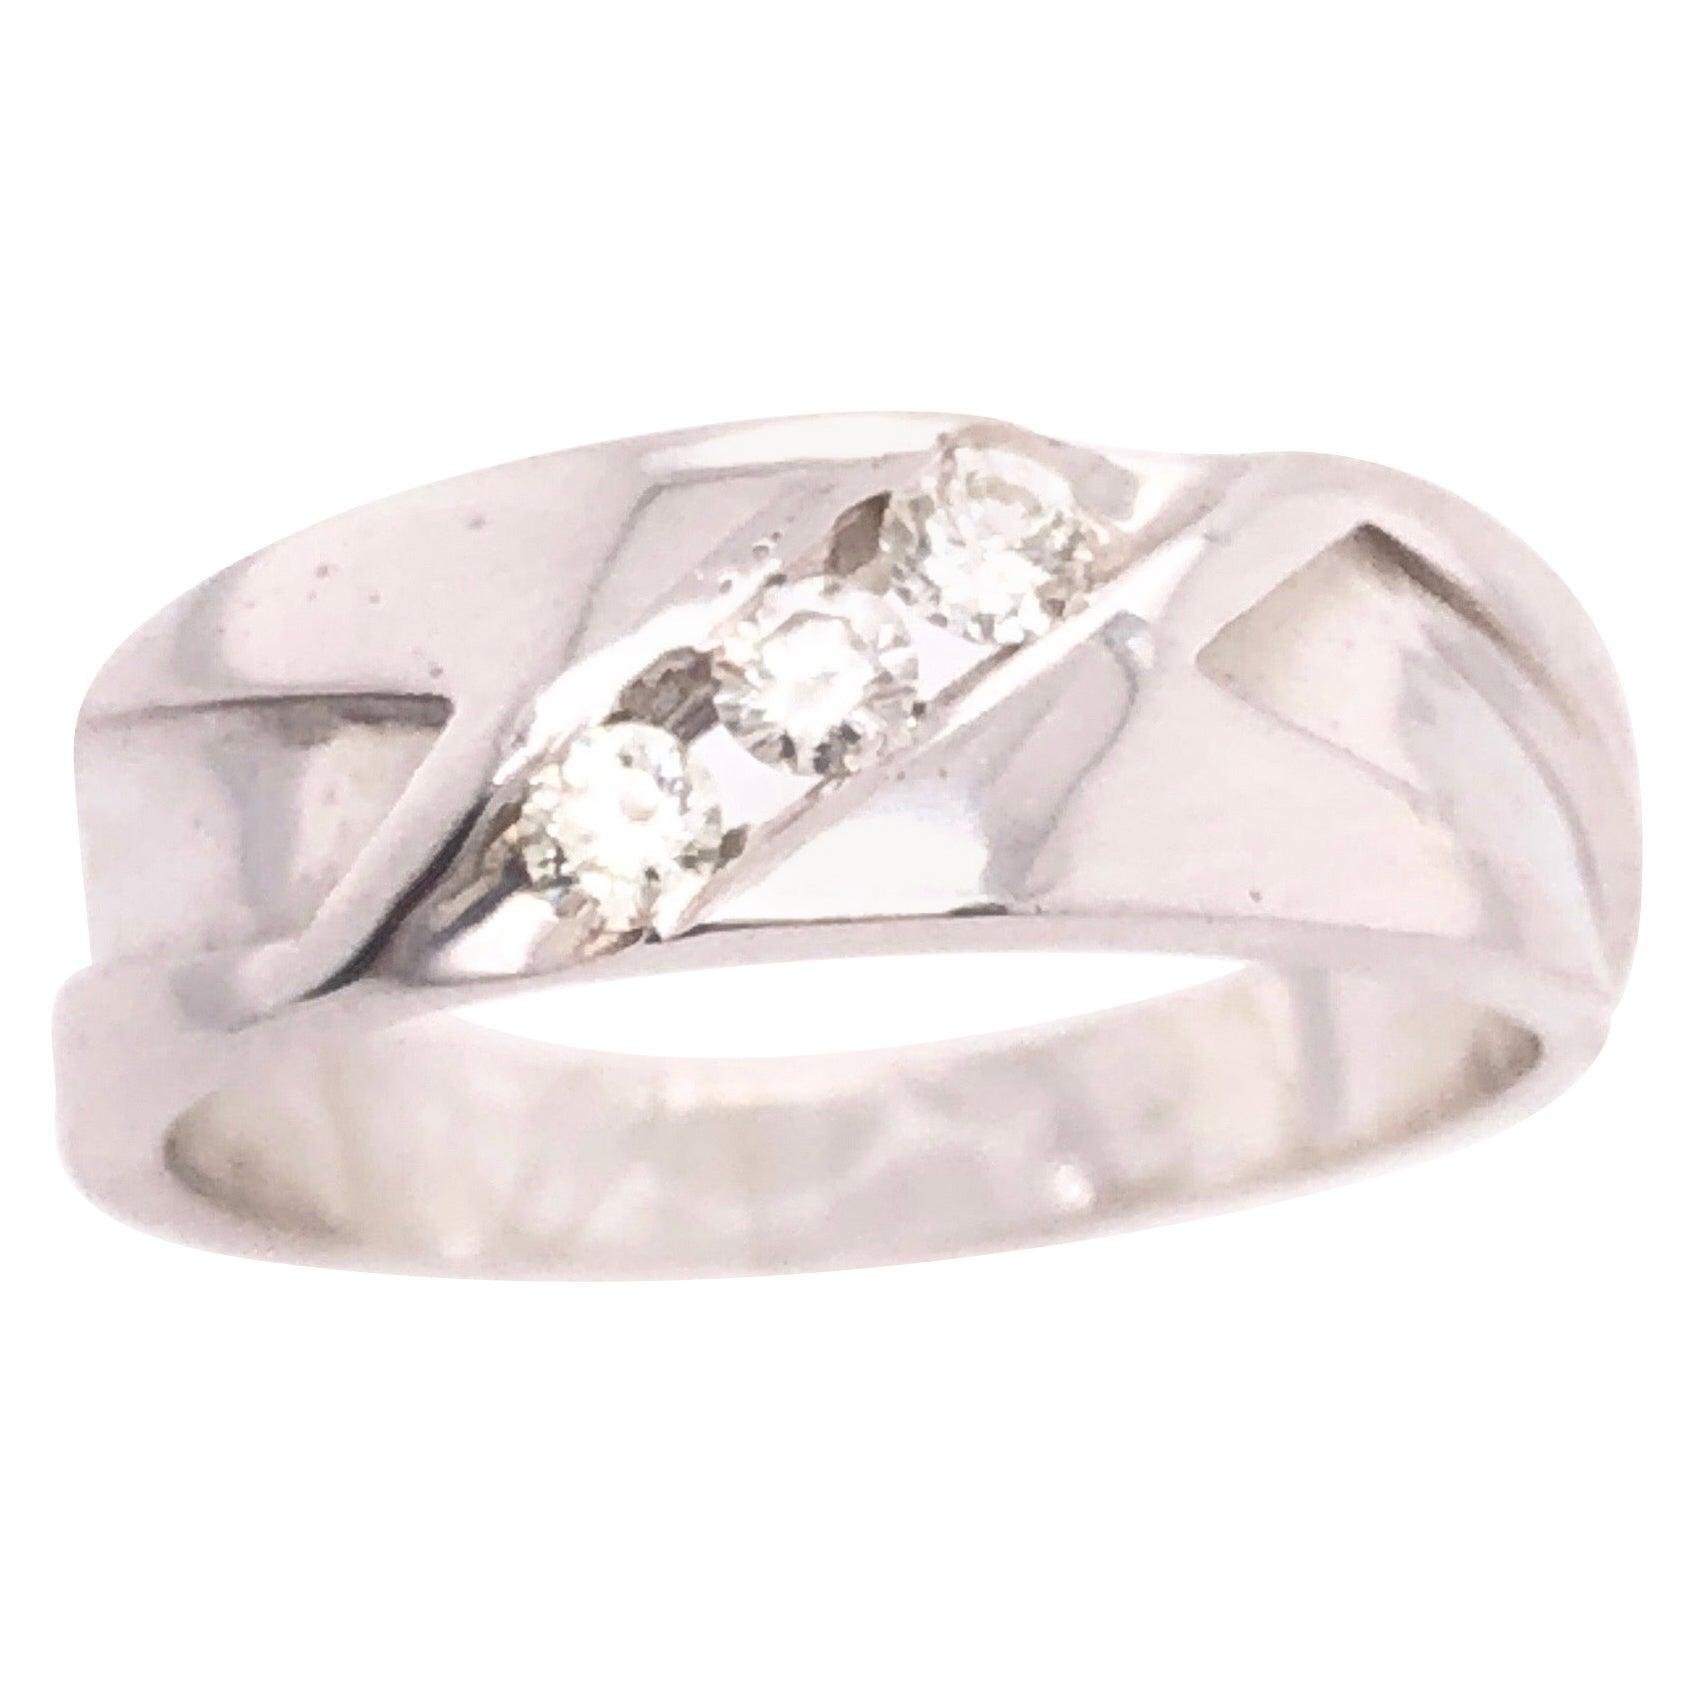 14 Karat White Gold and Diamond Three-Stone Band Wedding Bridal Ring